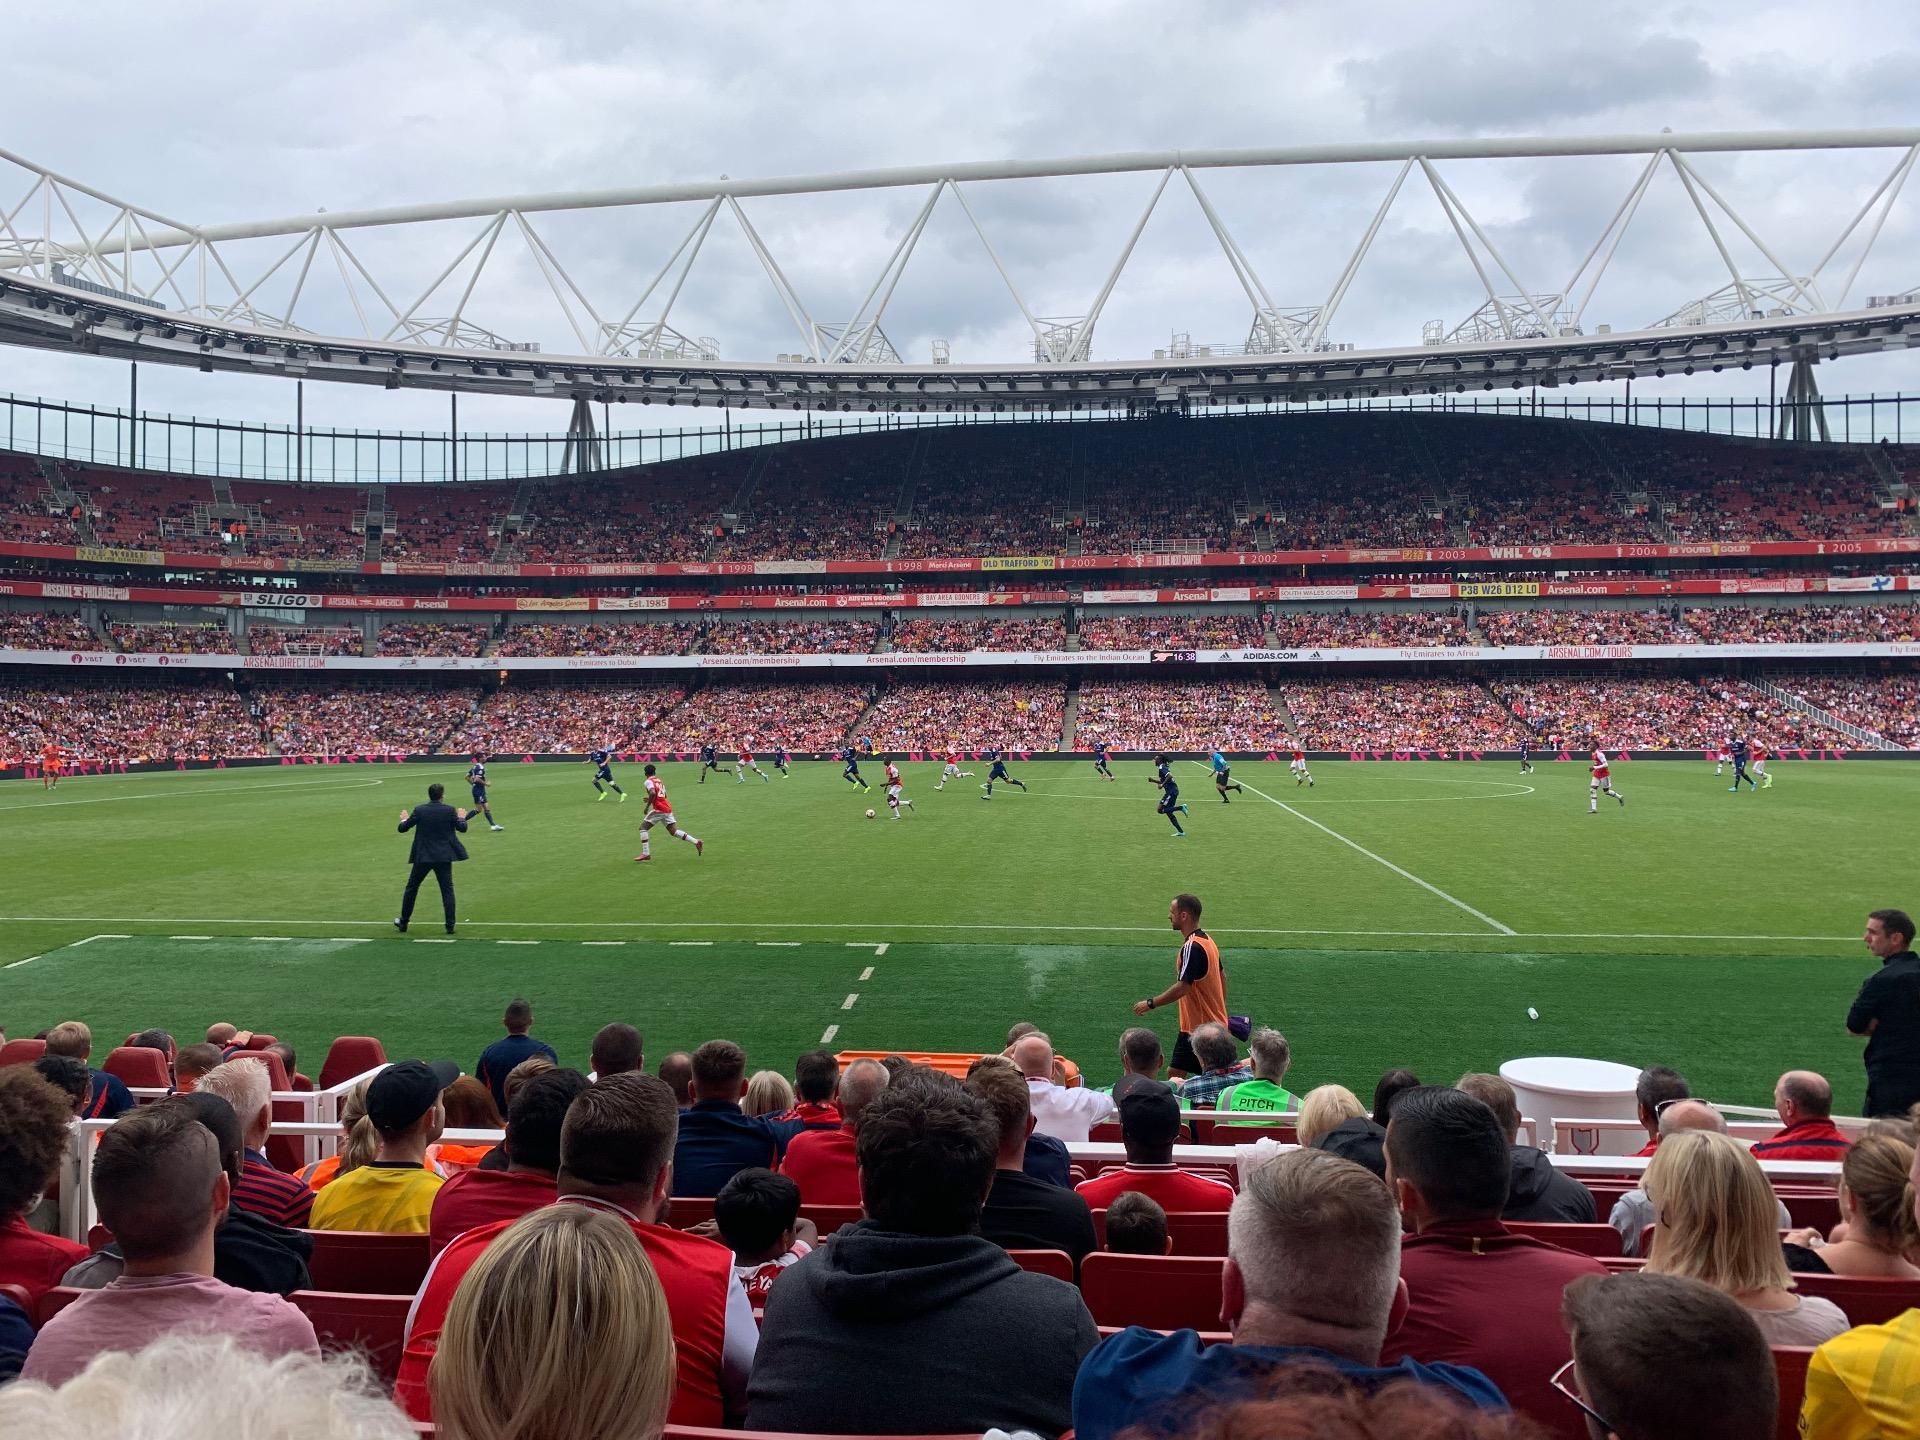 Emirates Stadium Section 1 Row 11 Seat 11